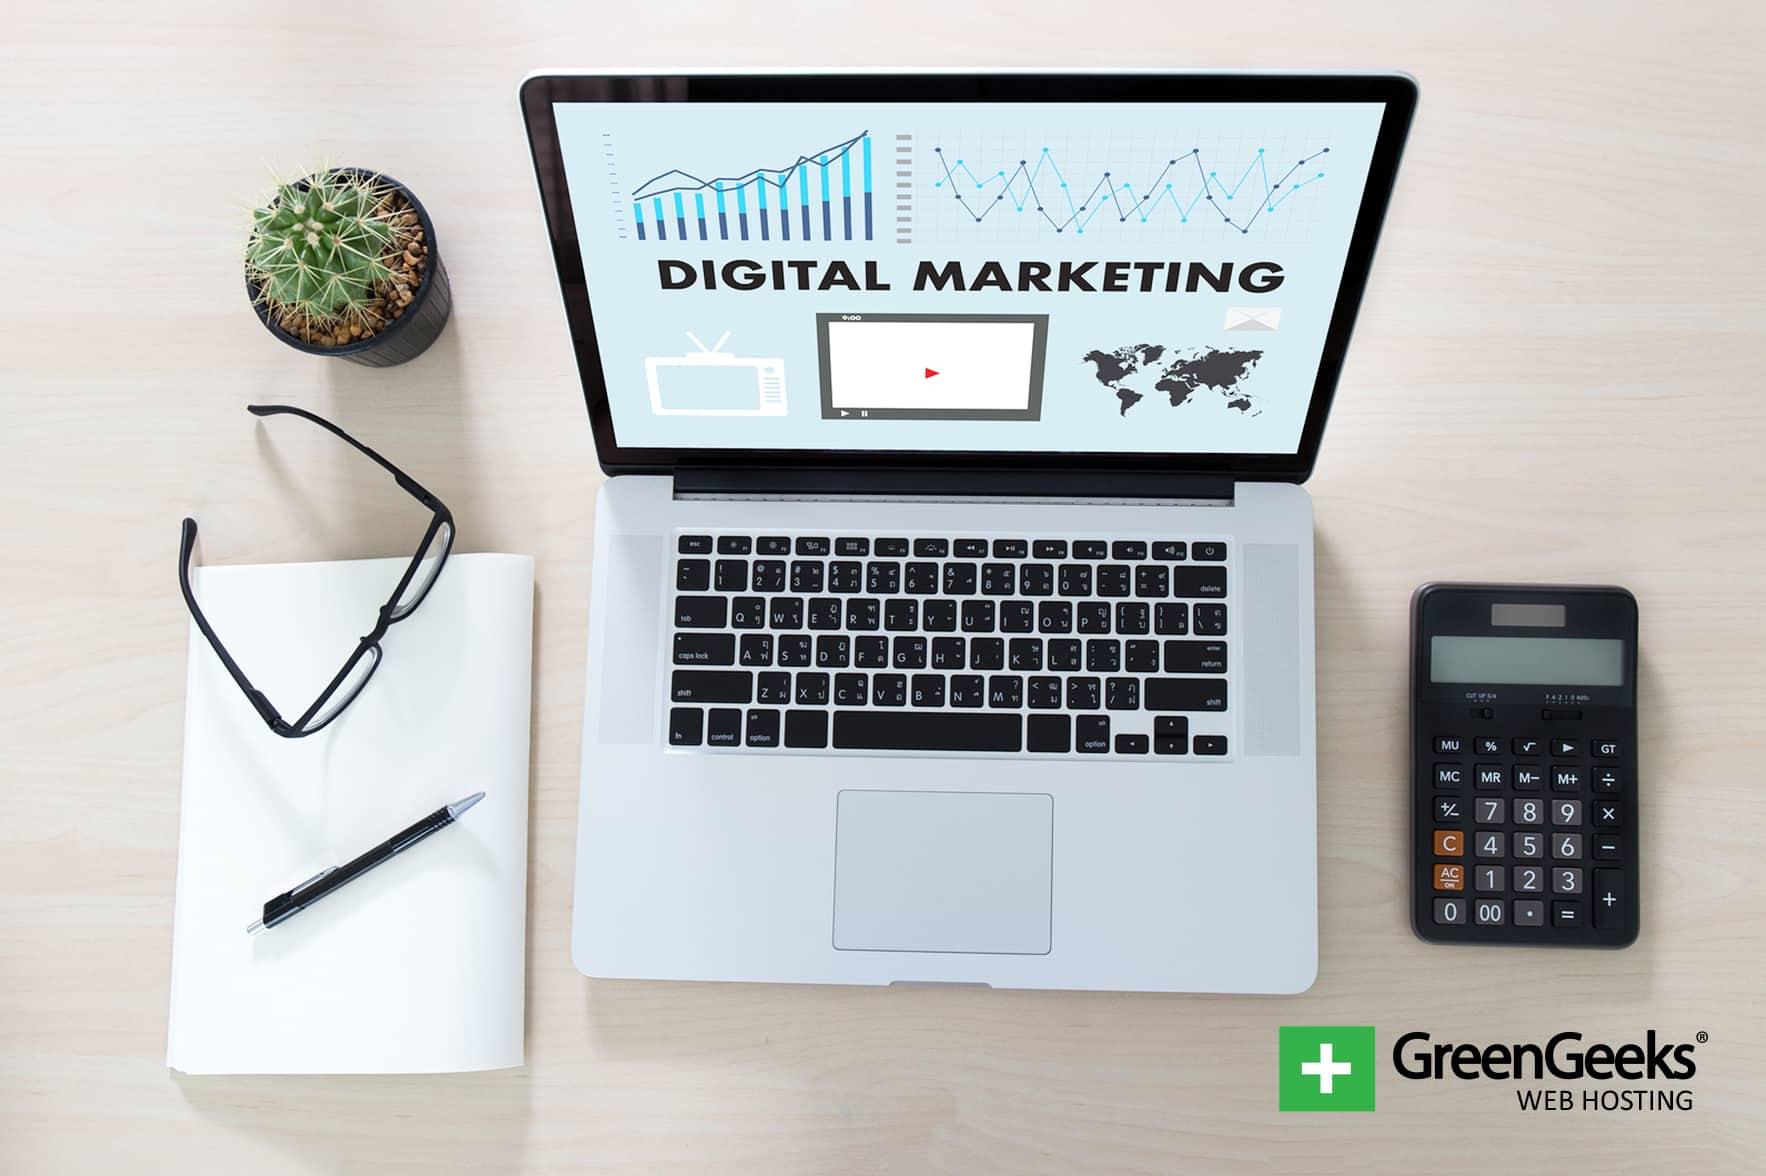 Digital marketing channels